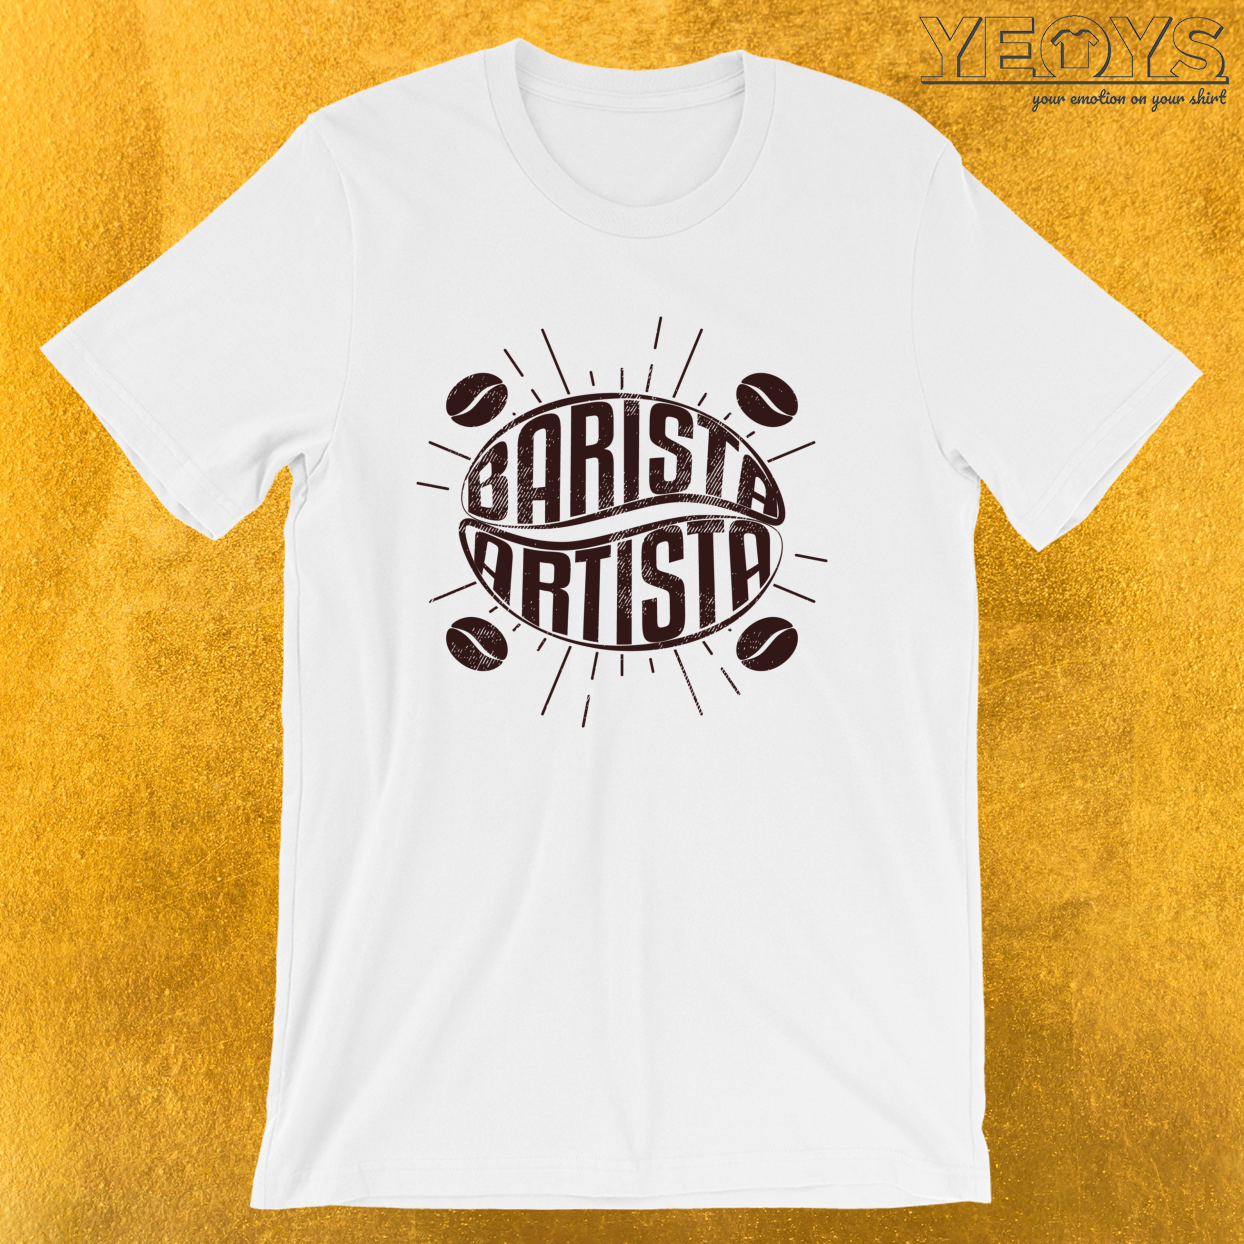 Barista Artista – Barista Art Life Tee